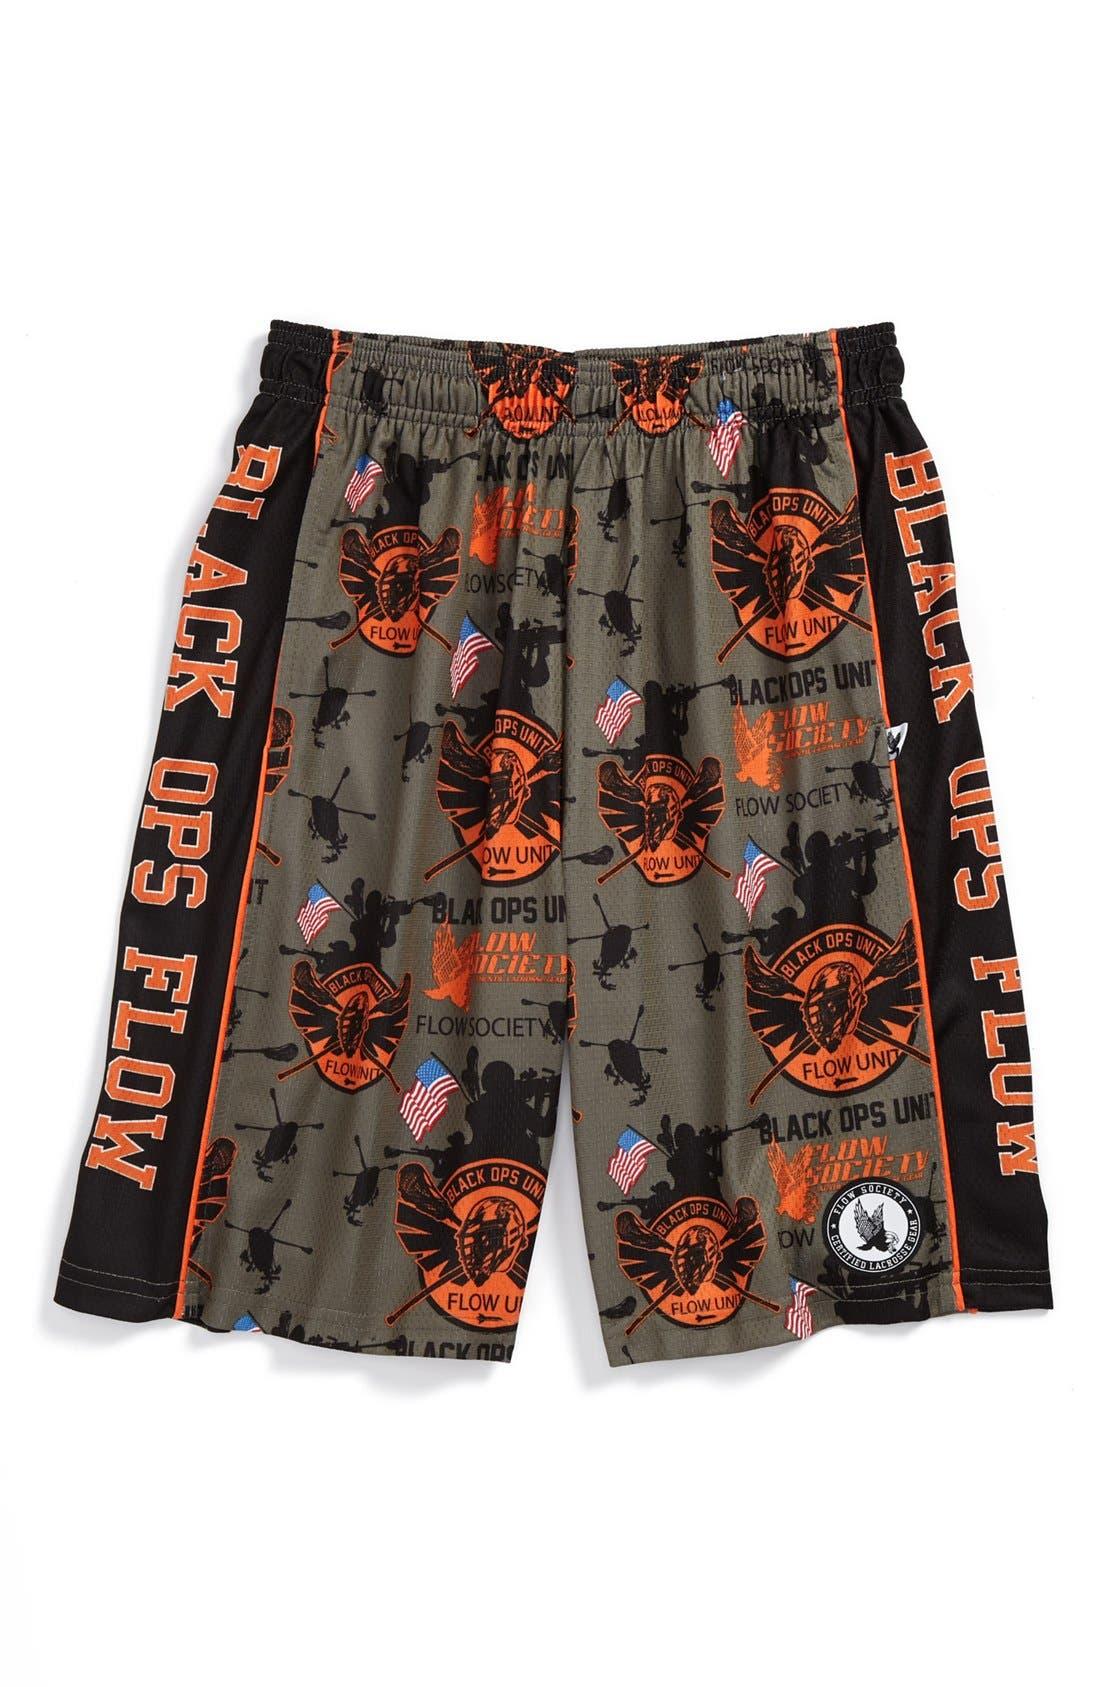 Main Image - Flow Society 'Black Ops Flow' Lacrosse Shorts (Little Boys & Big Boys)